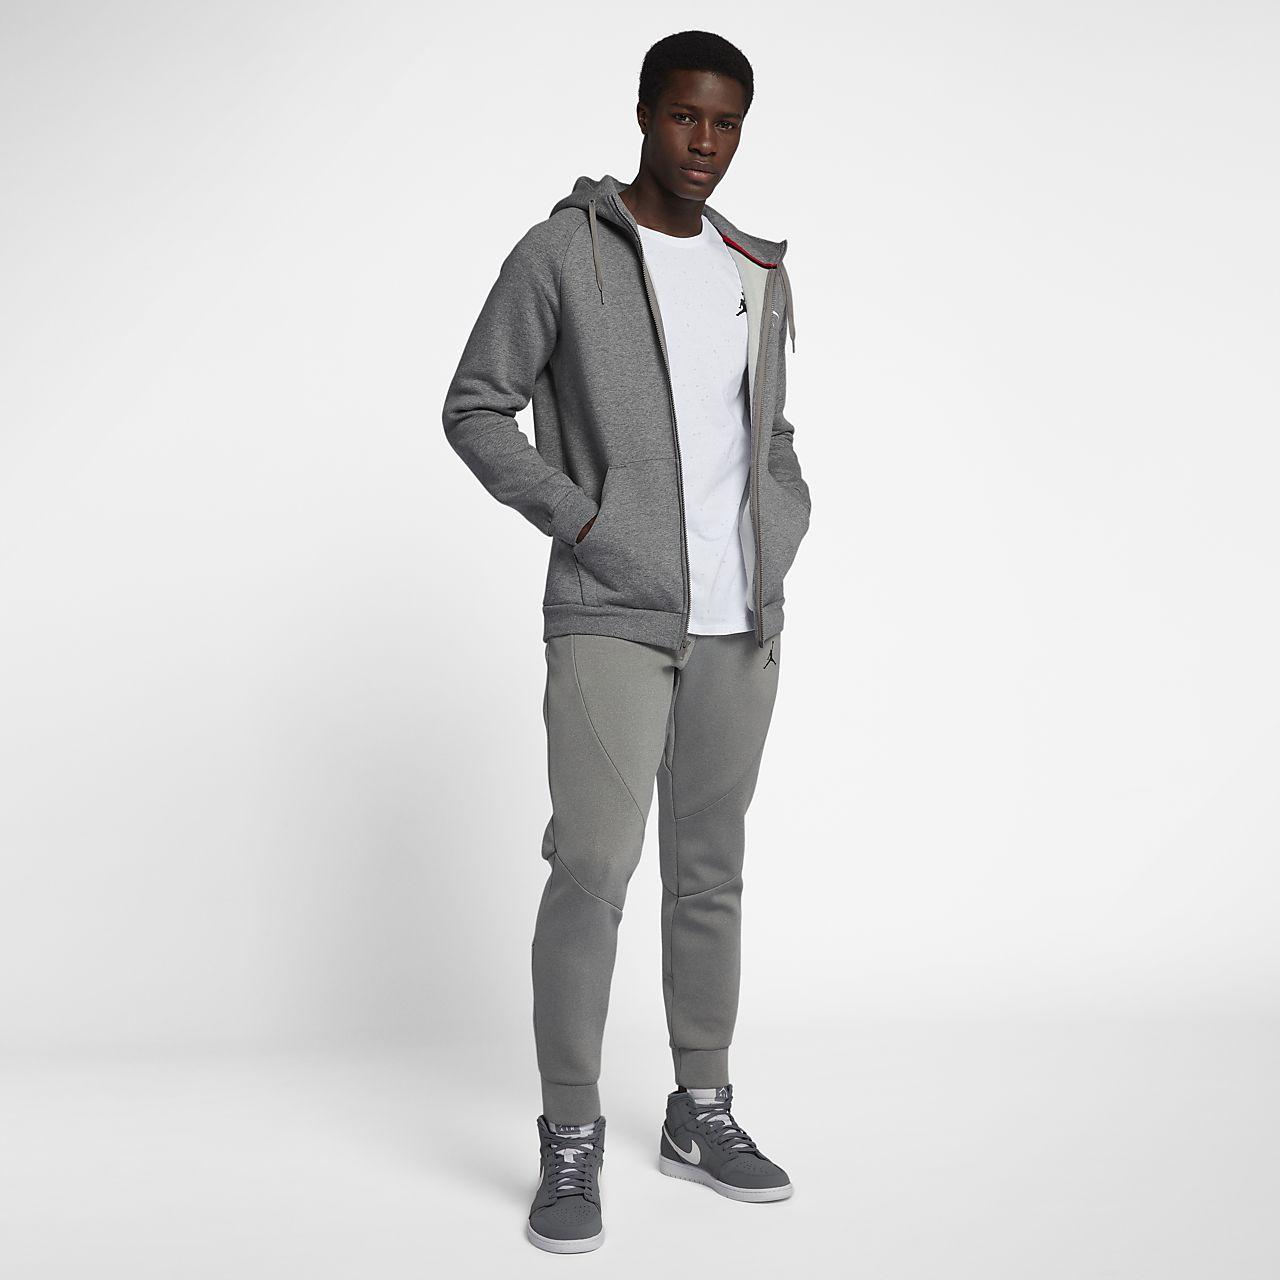 0c5ae1aba9f8 Jordan Jumpman Men s Fleece Full-Zip Hoodie. Nike.com DK